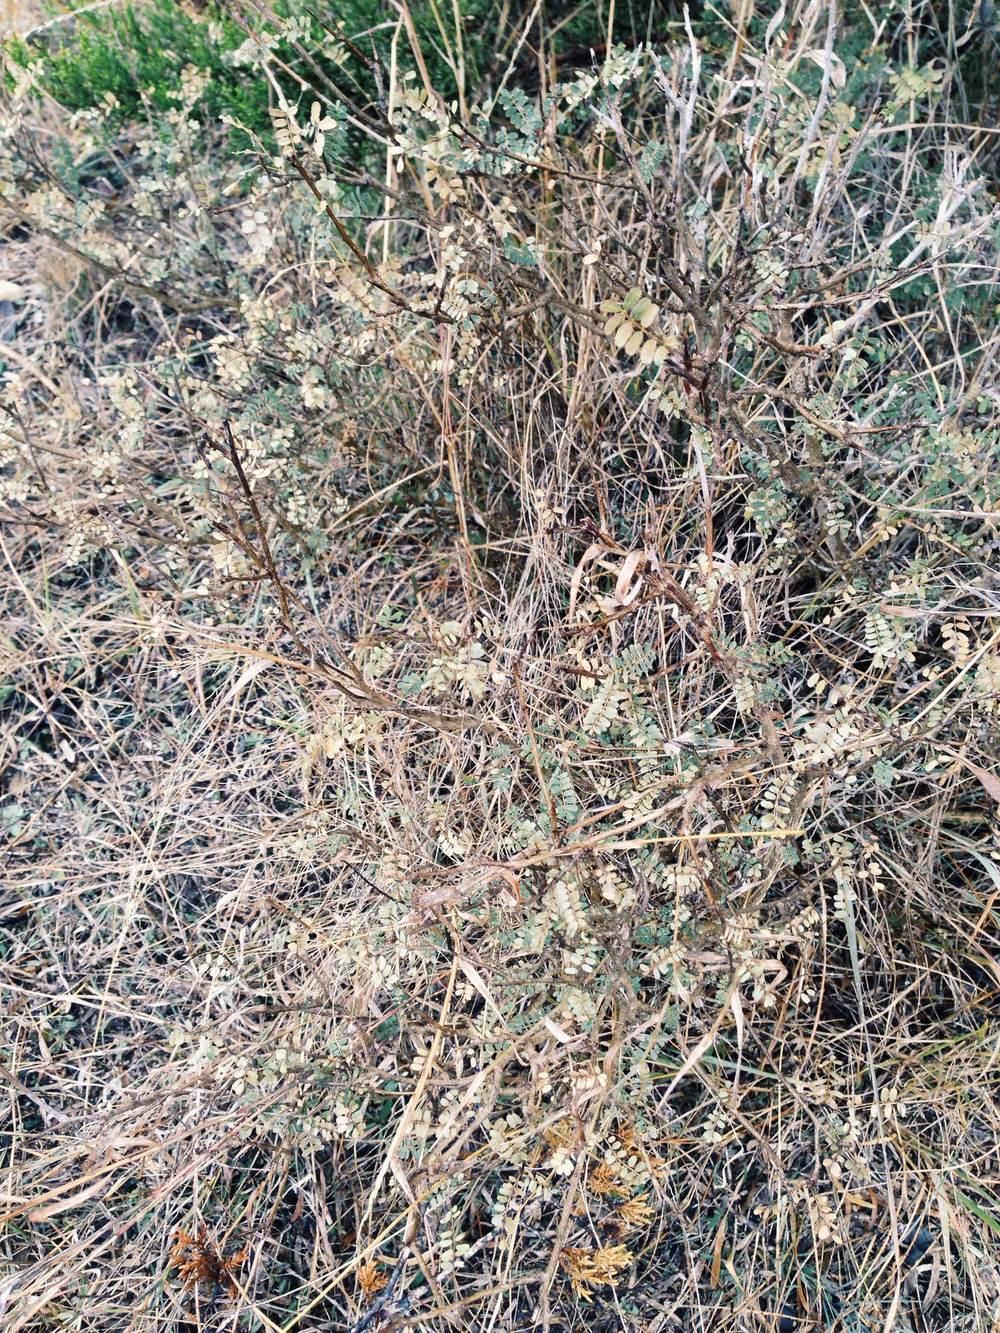 Plant: Dalea sp. (?) | Location: Double Eagle Ranch, Burnet Co., Texas